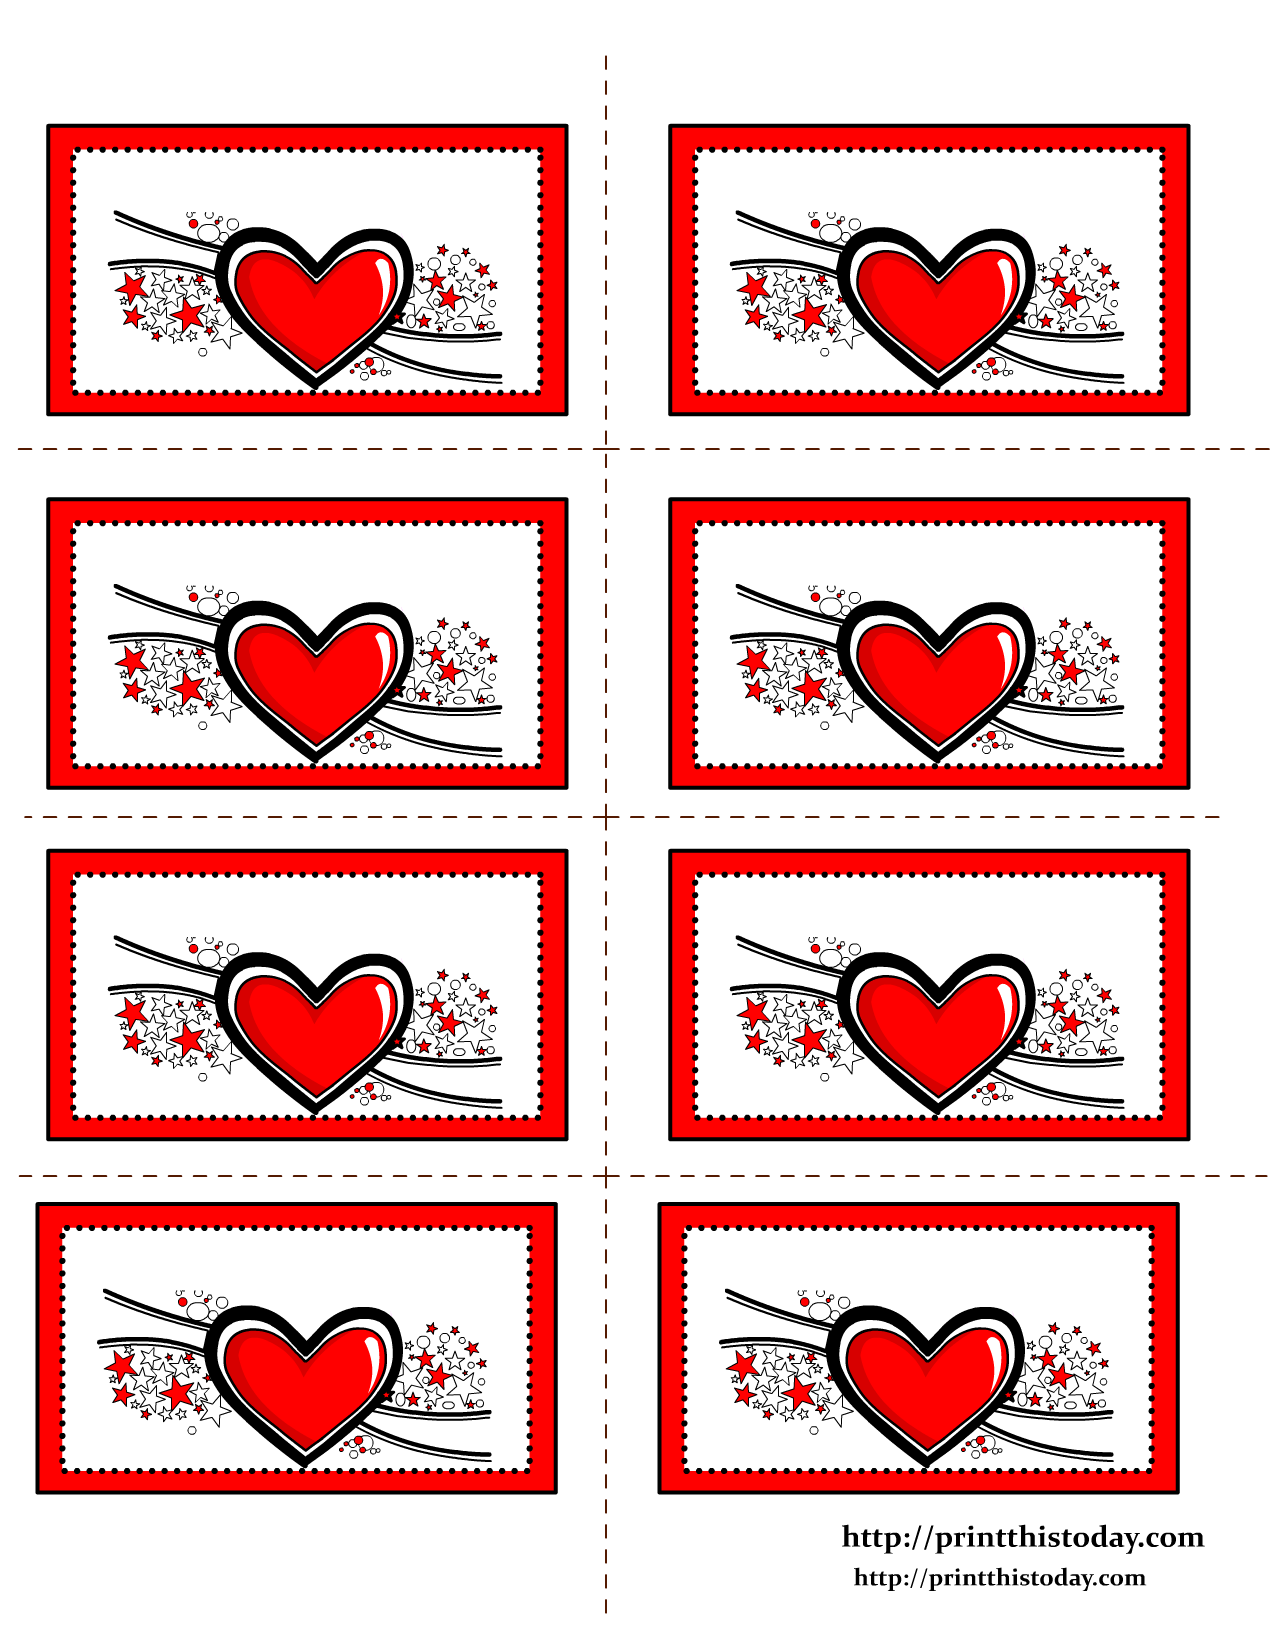 Free Printable Hearts Labels Labels Printables Free Heart Printable Valentines Printables Free